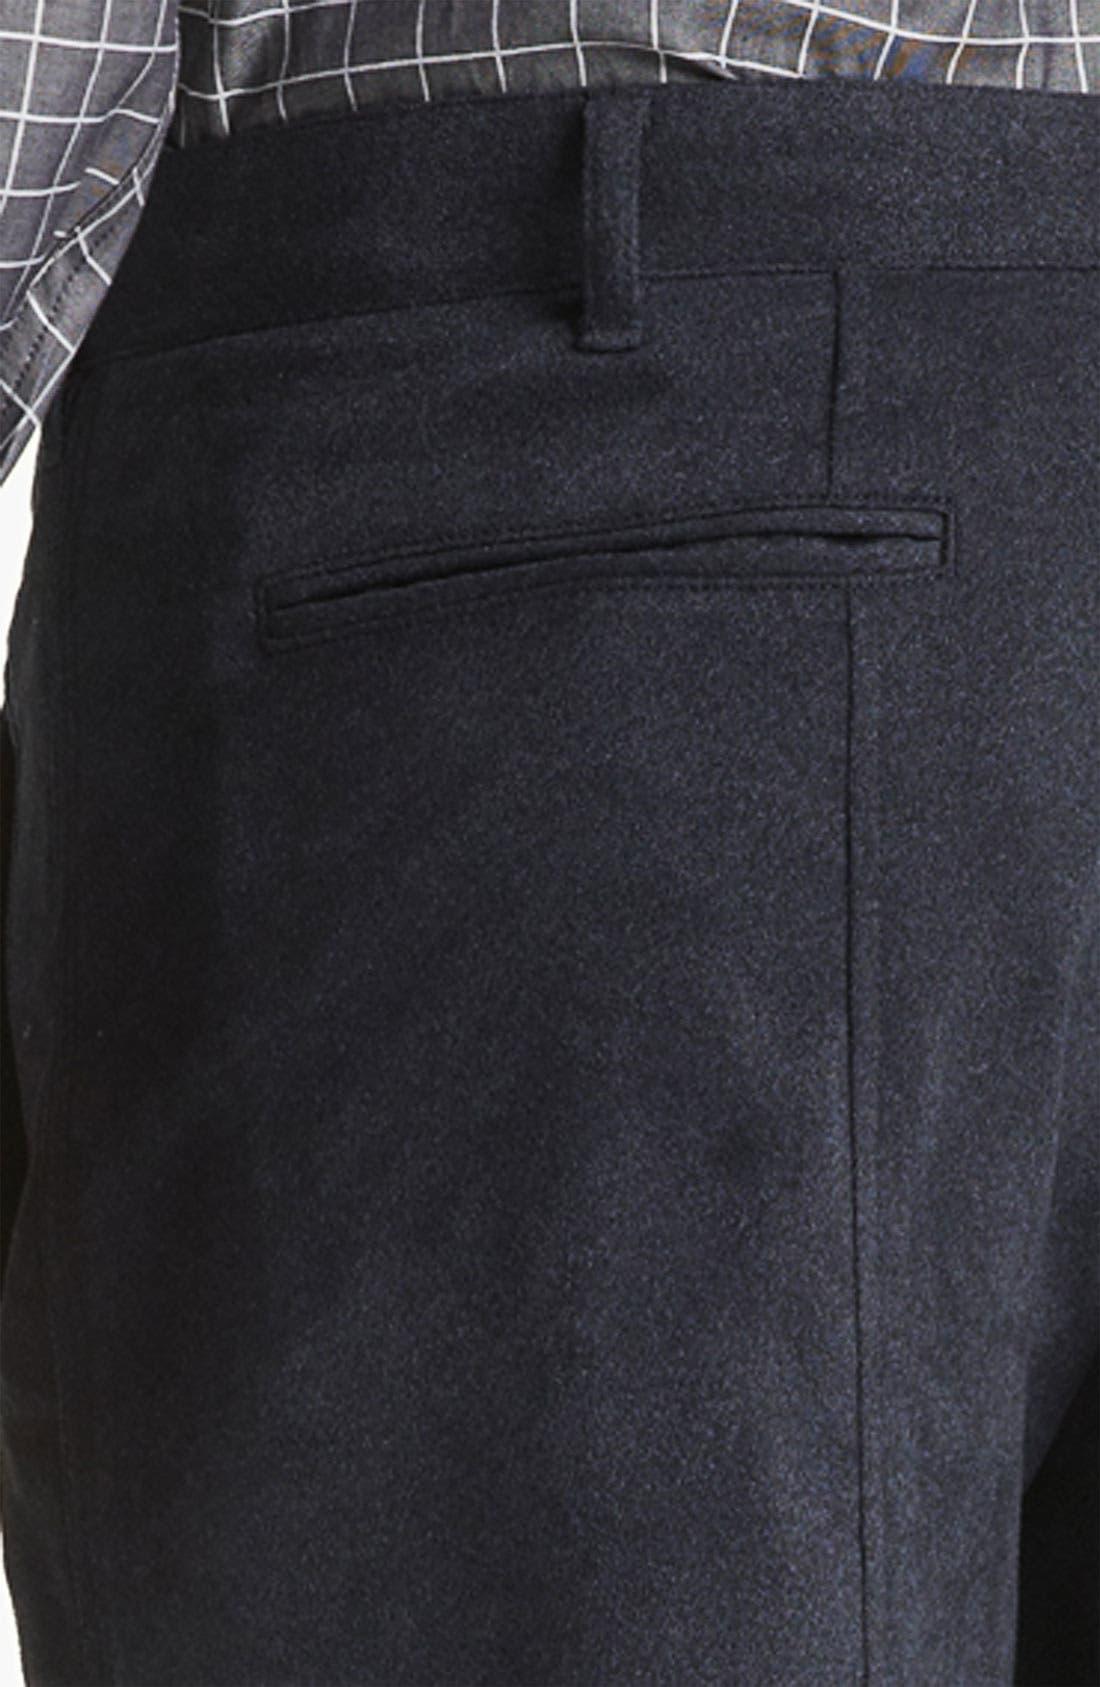 Alternate Image 3  - Armani Collezioni Dress Pants